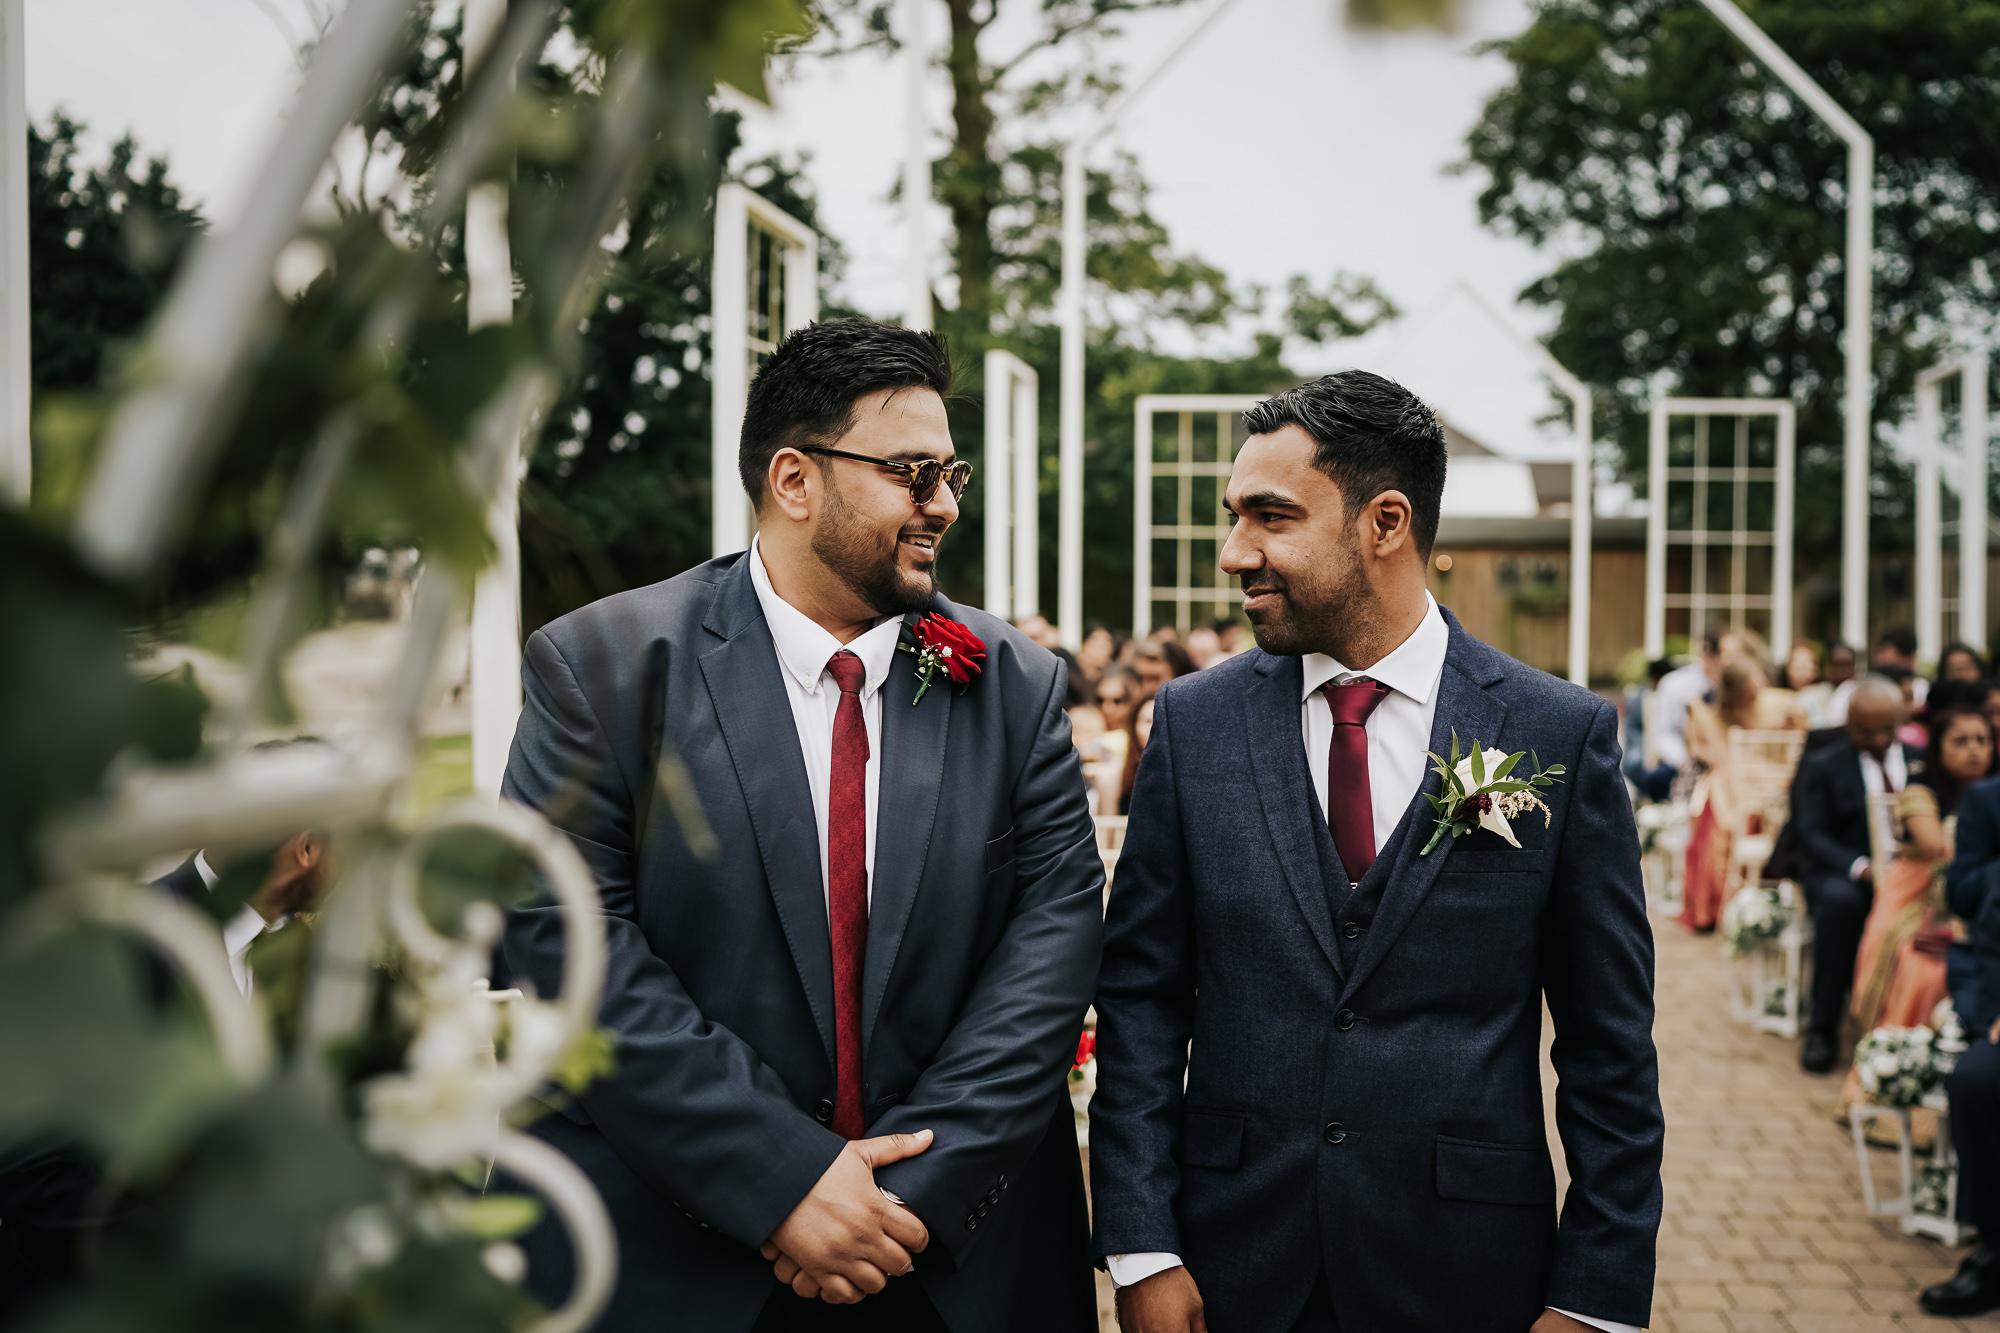 Alcumlow Hall Farm Indian Wedding Photographer (26 of 44).jpg